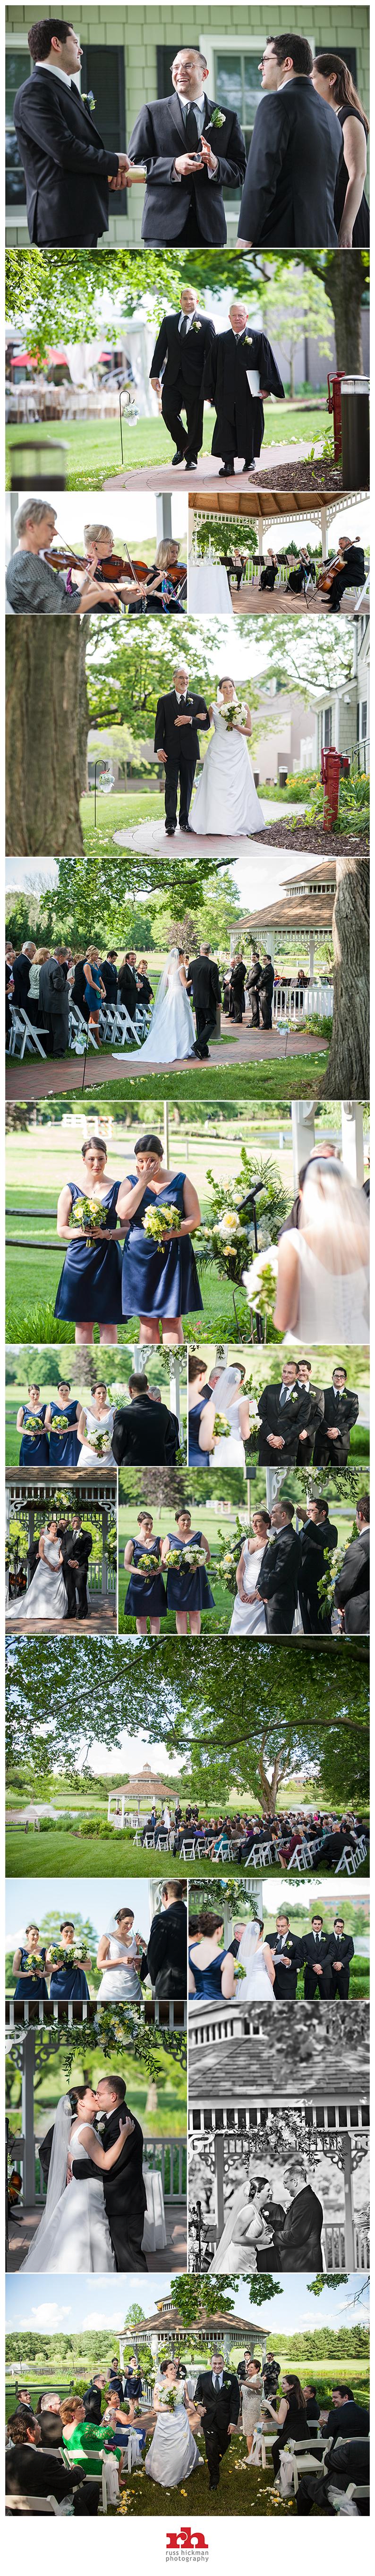 Philadelphia Wedding Photographer MZWB0003